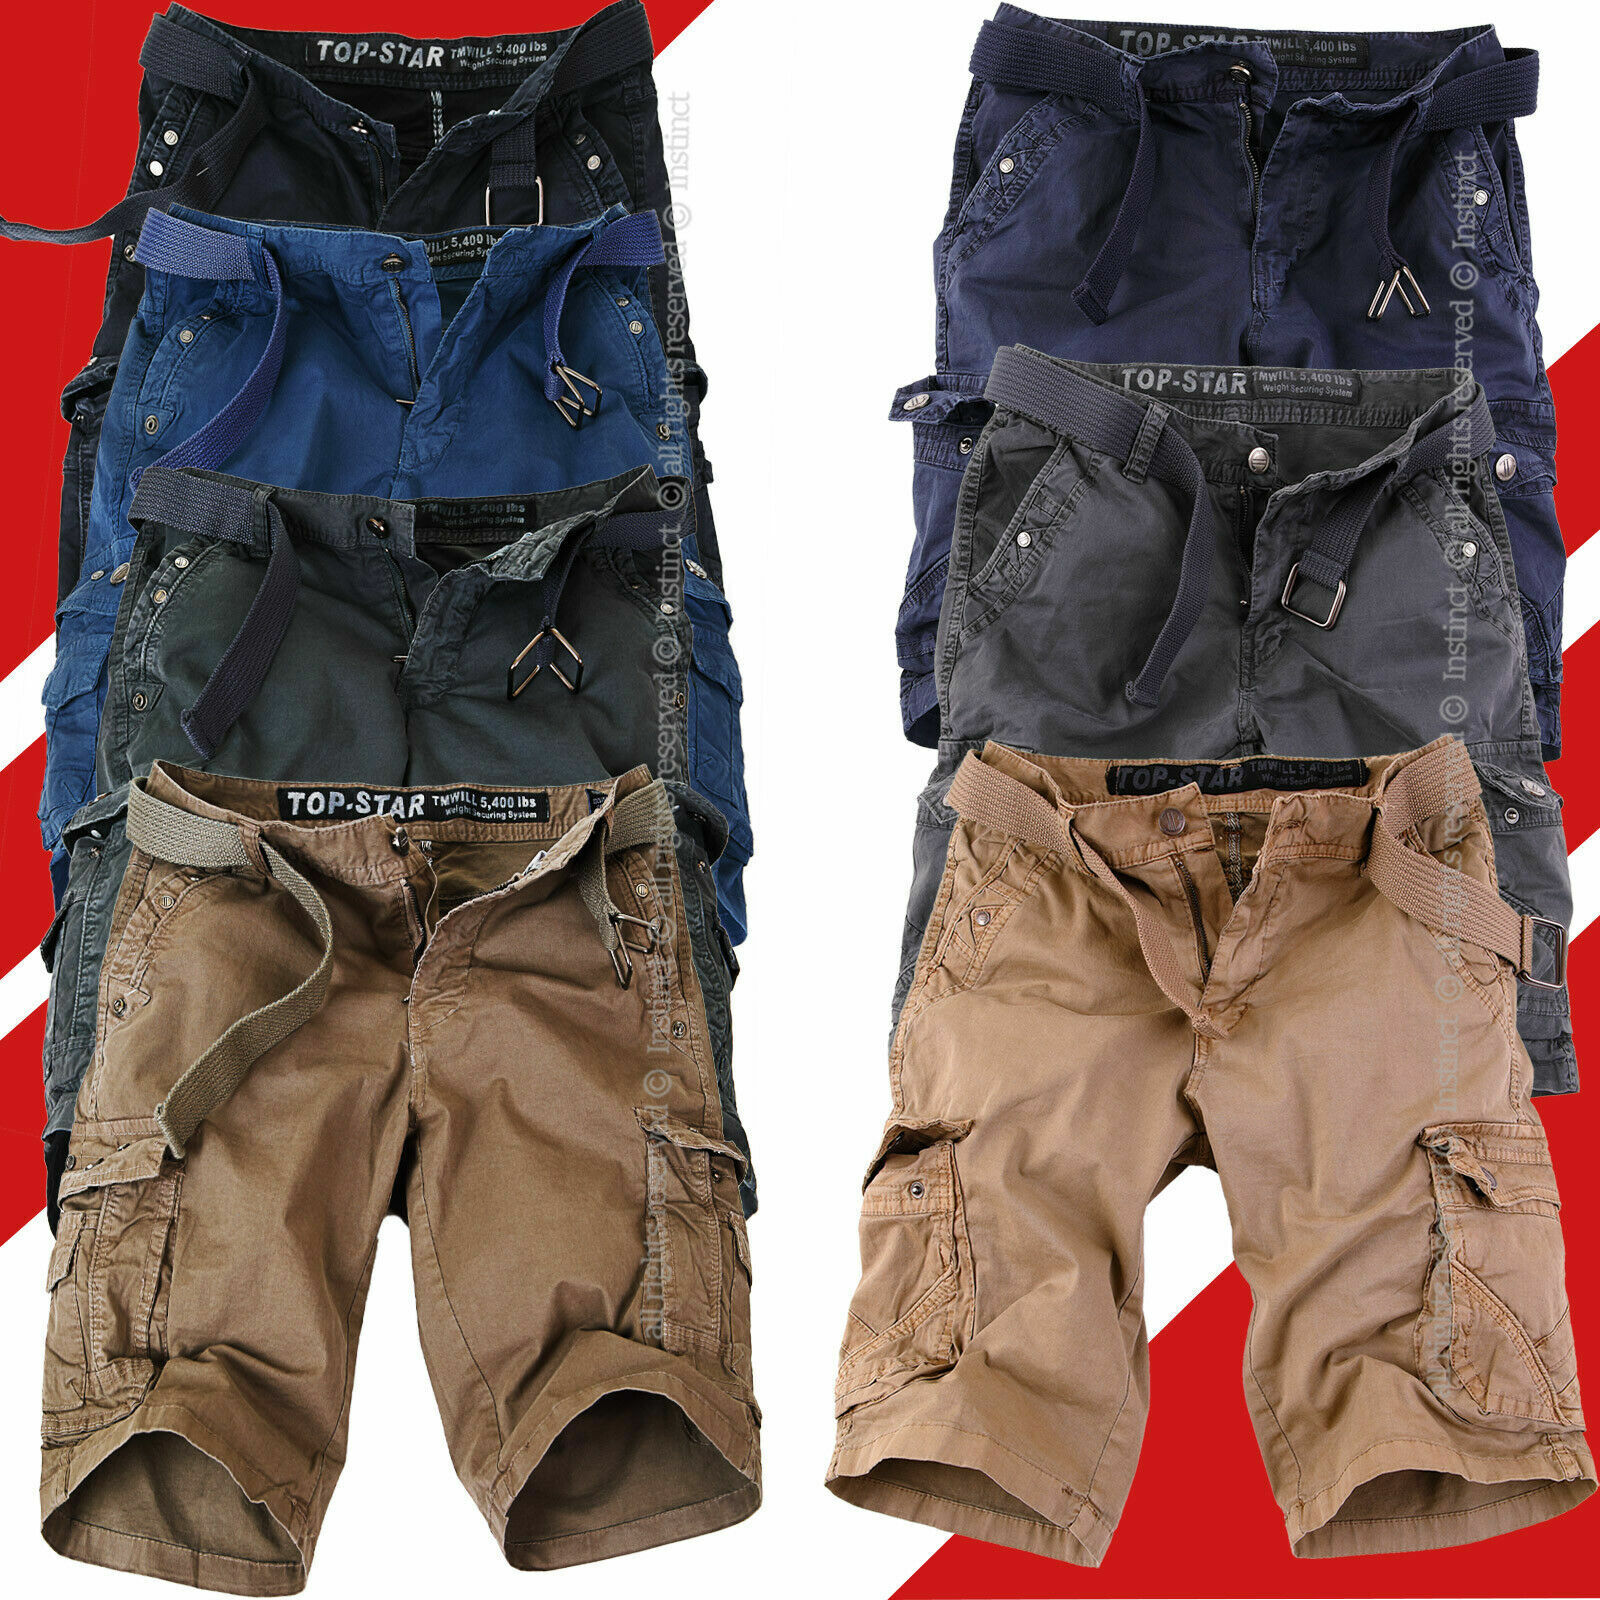 Bermuda Uomo Cargo Pantaloni Corti Pantaloncini Shorts Tasche Laterali Tasconi